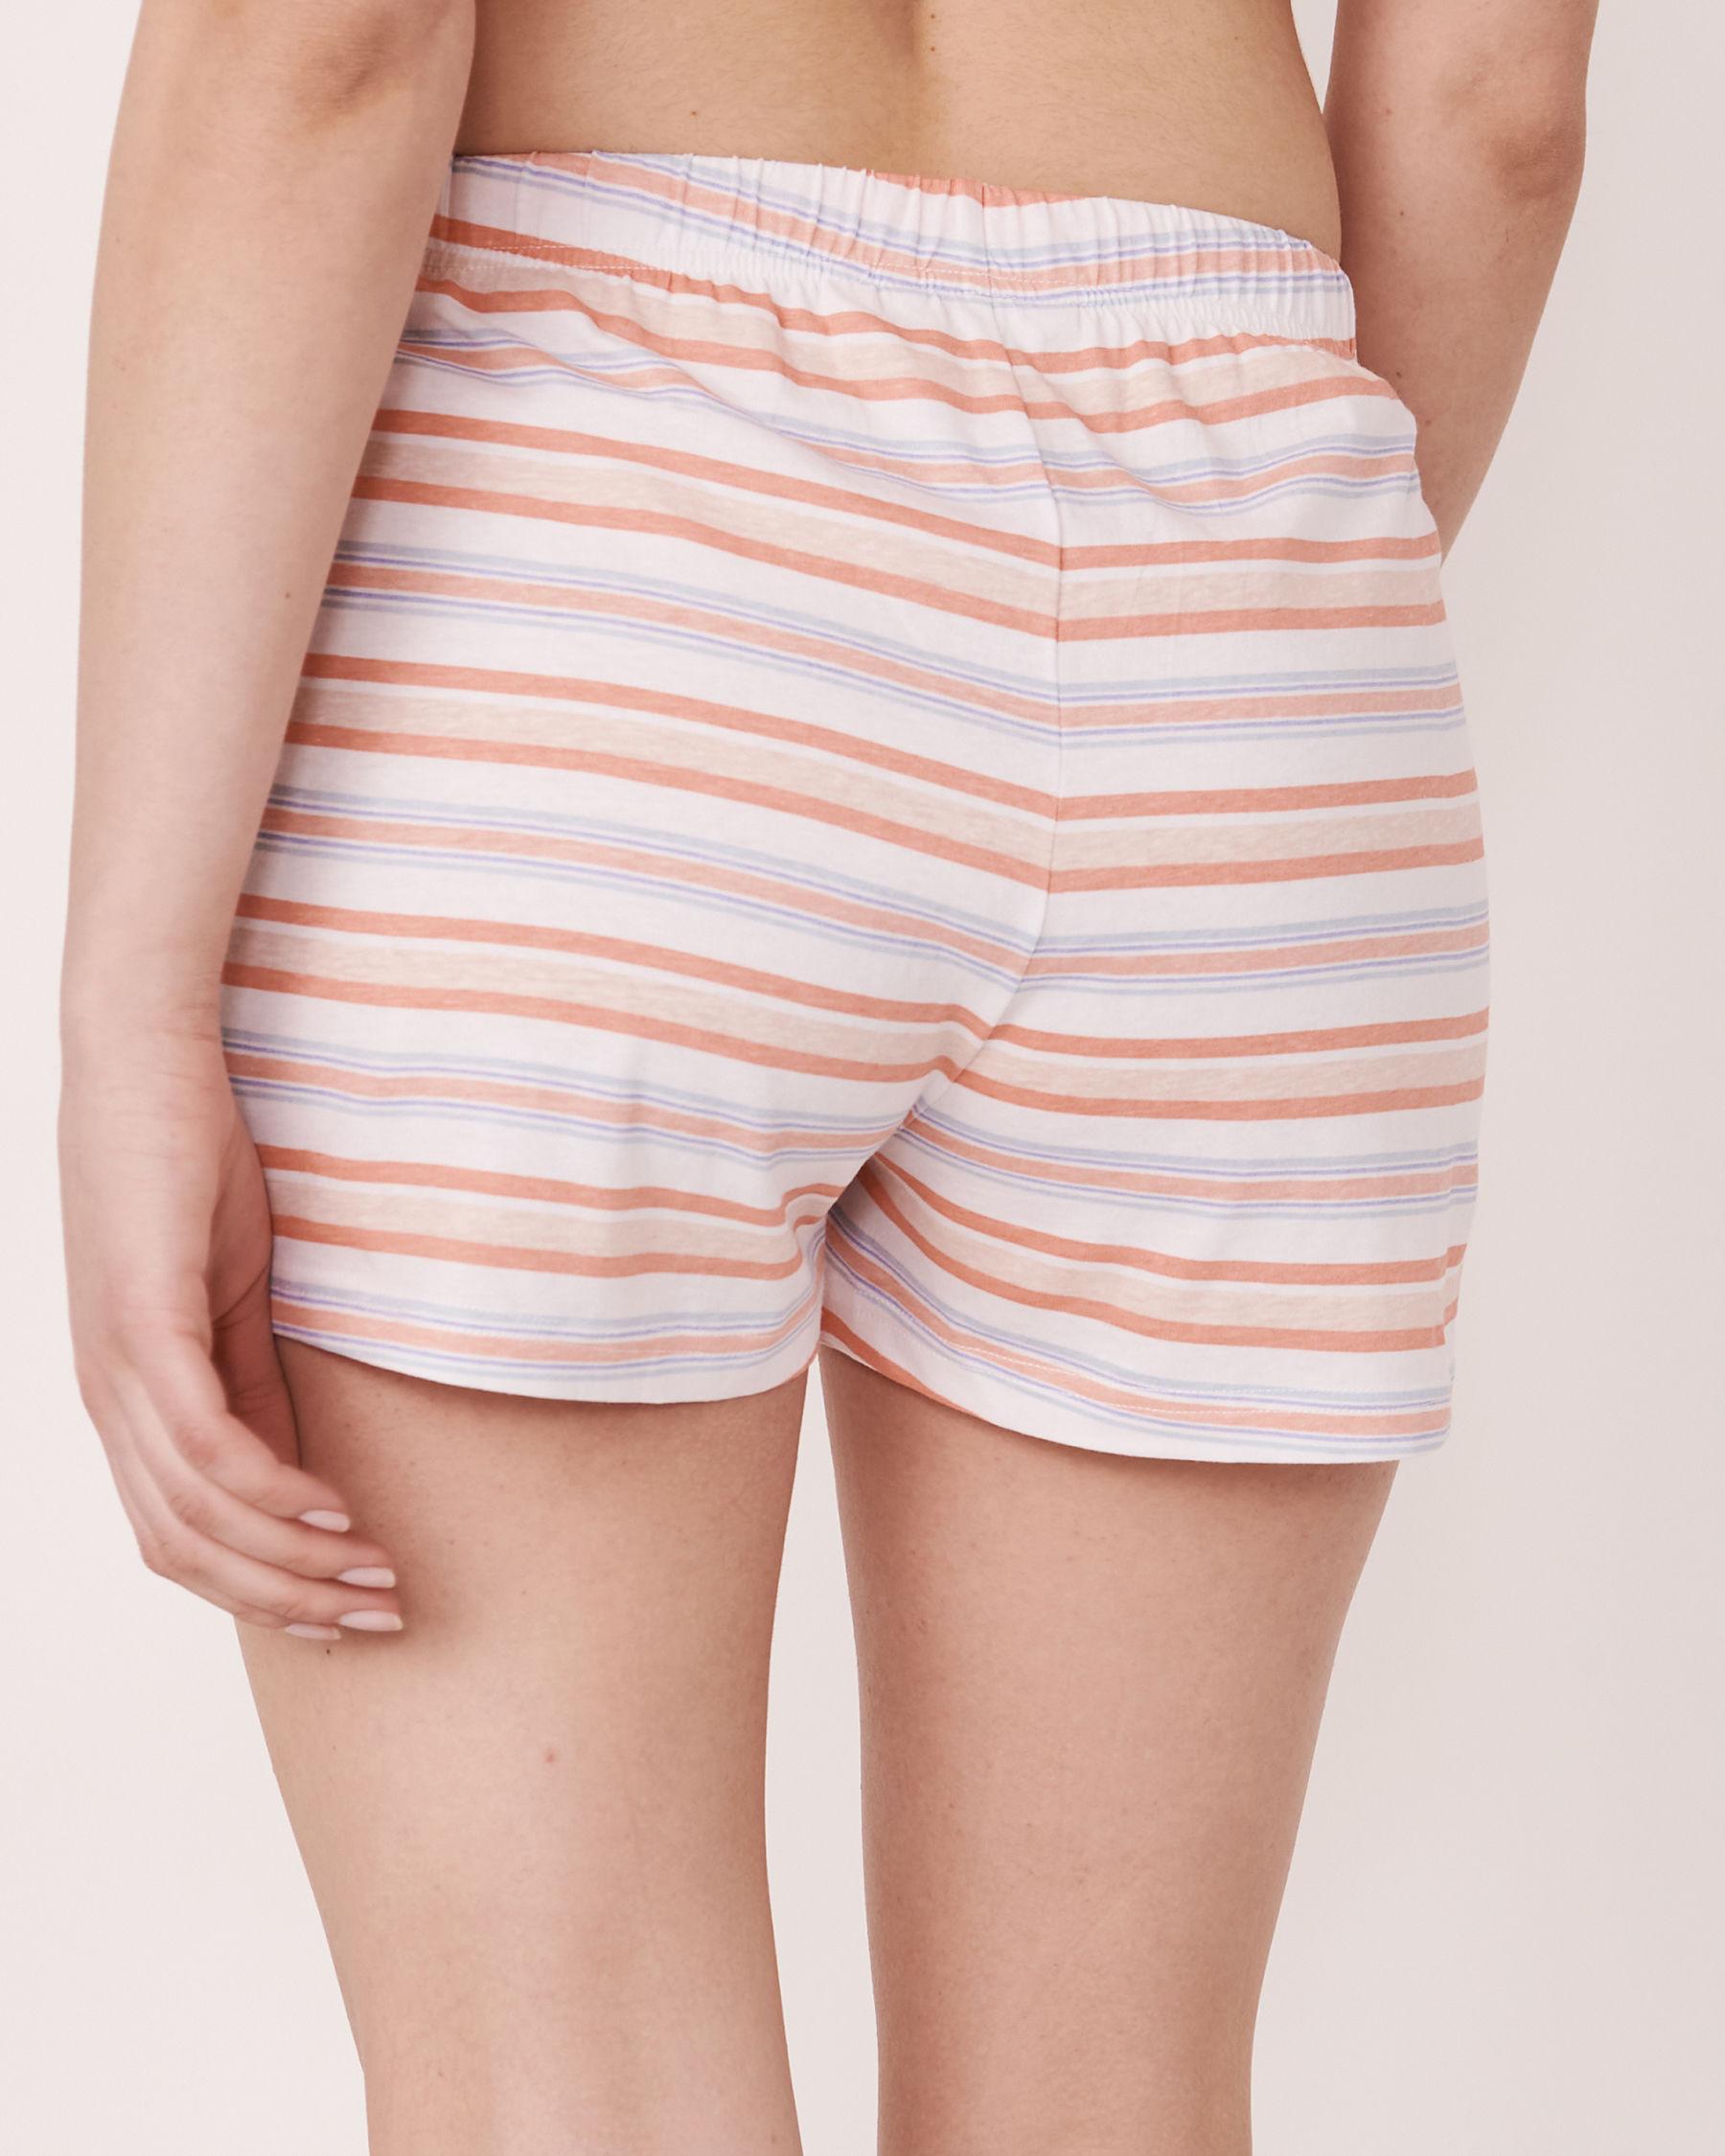 LA VIE EN ROSE Short de pyjama bande de taille élastique Rayures multicolores 40200039 - Voir2